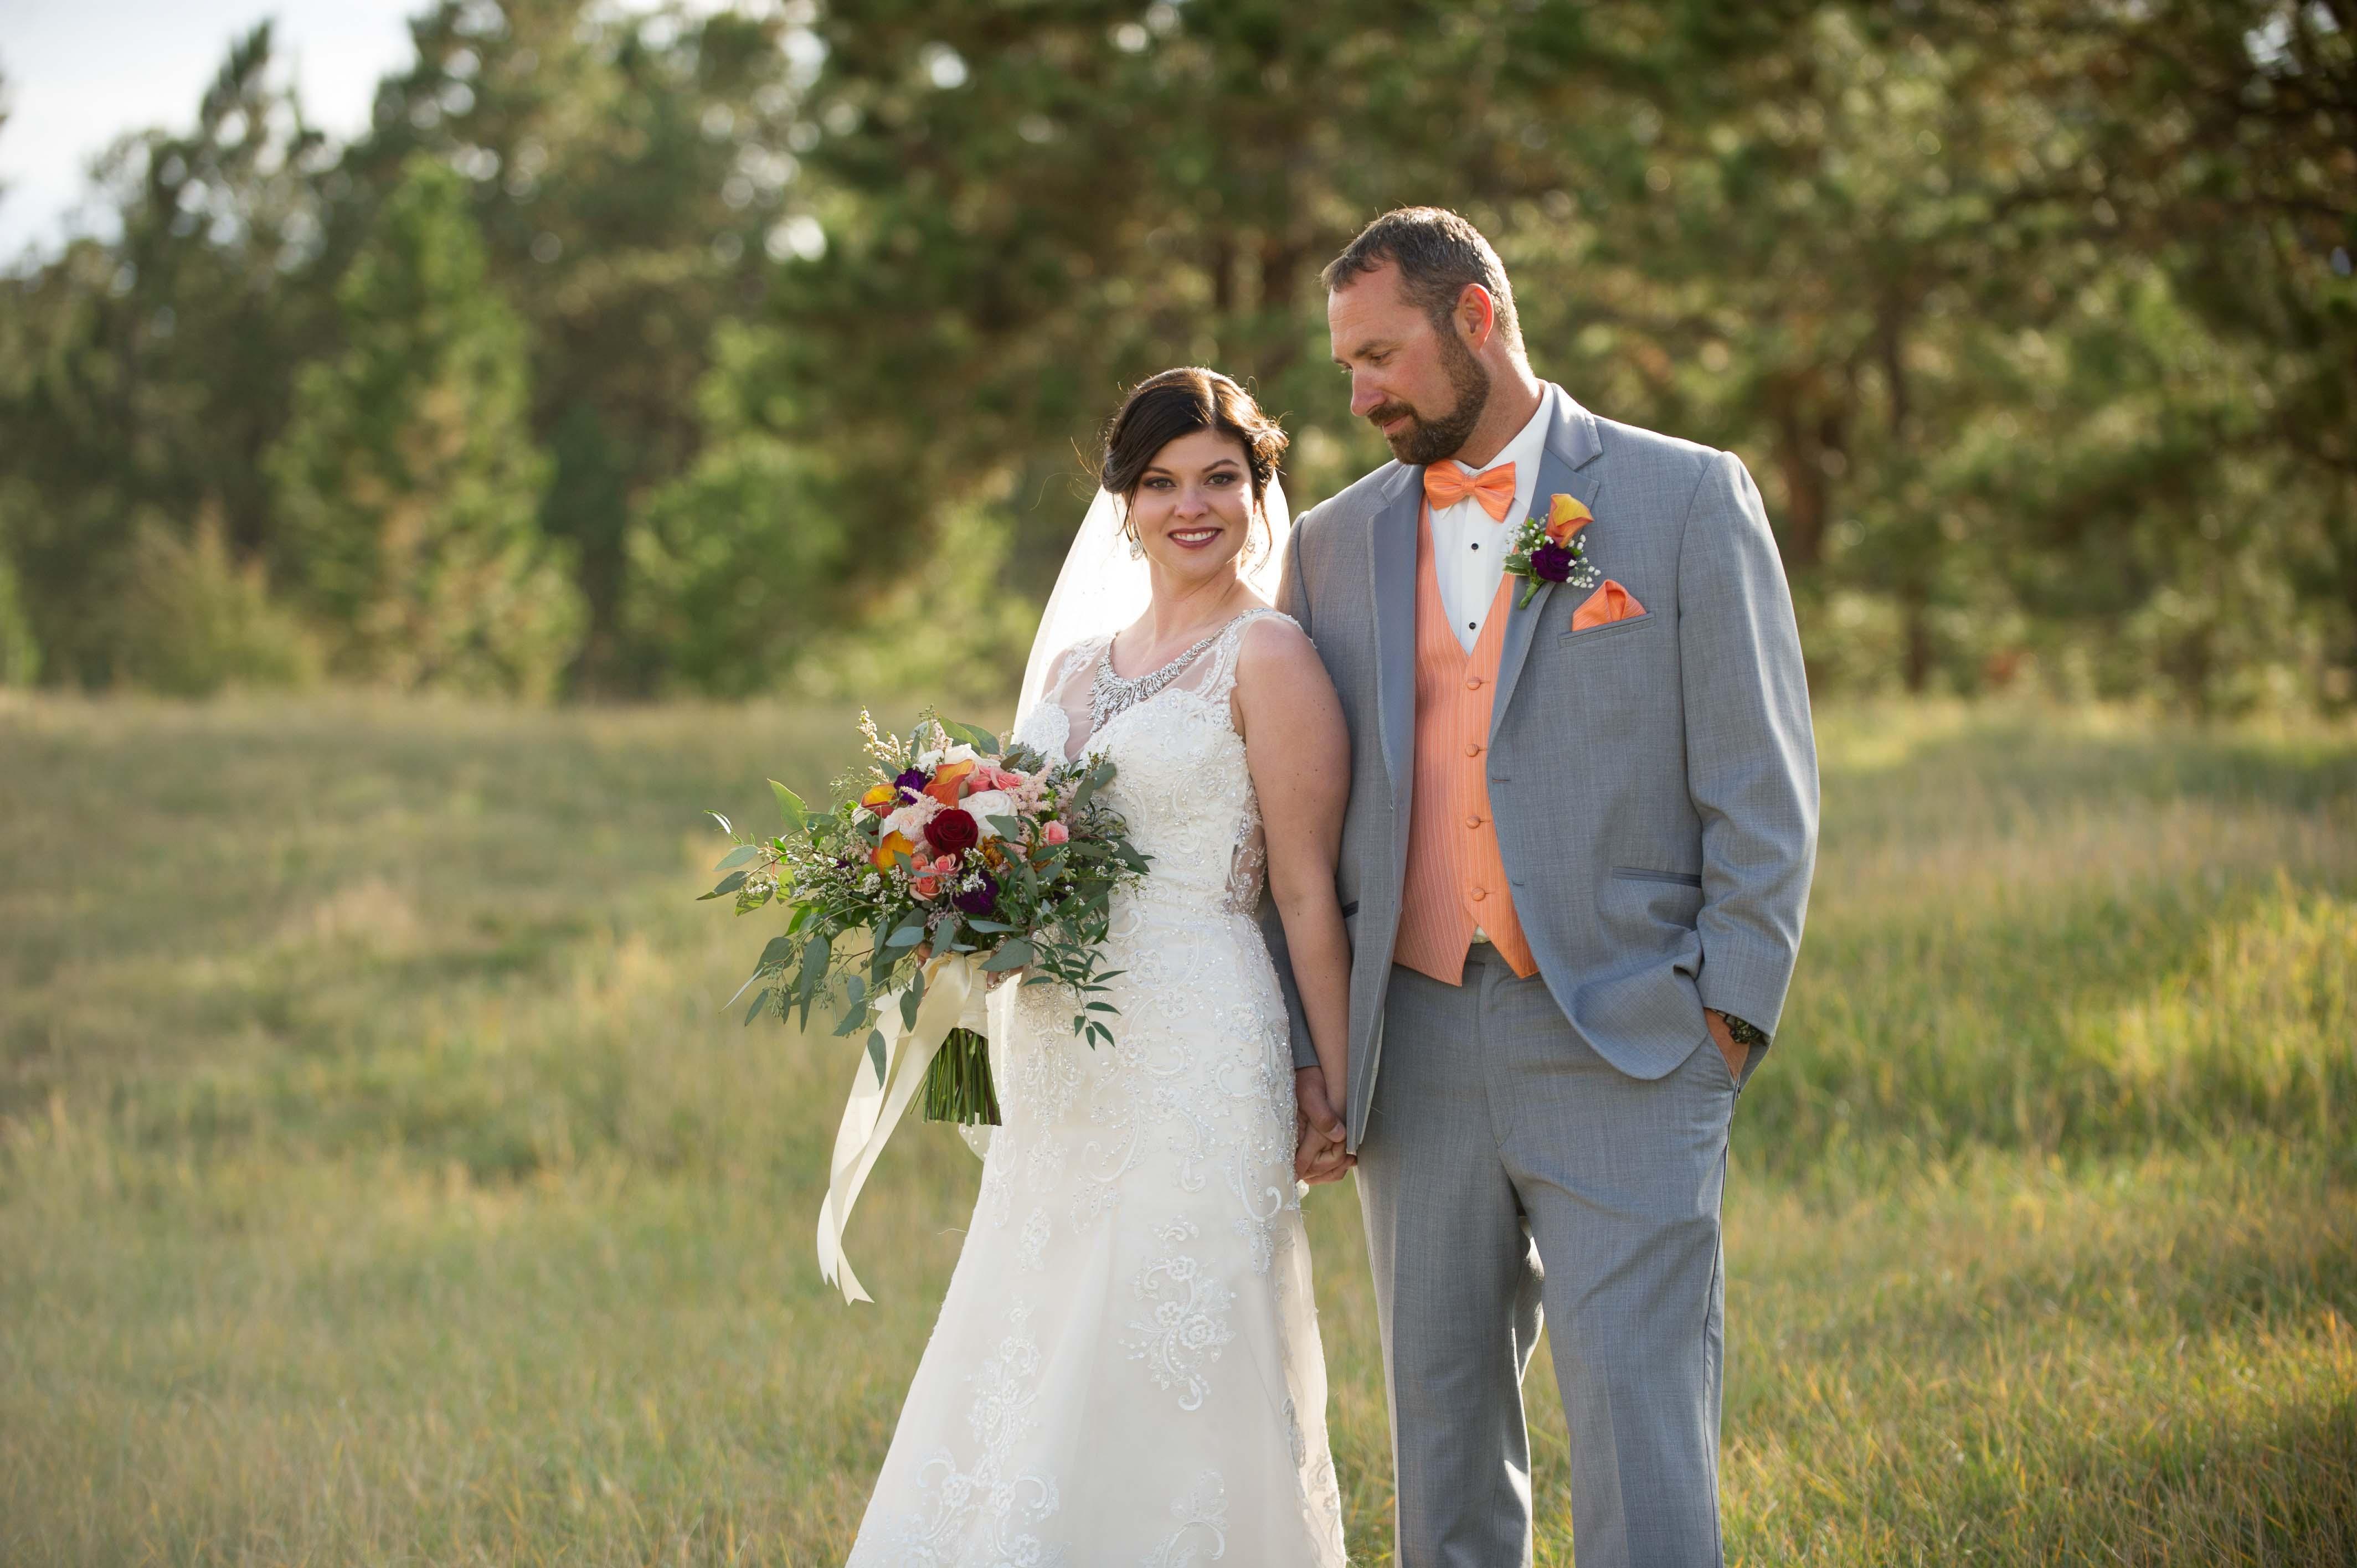 Ashley and Angelo {Rapid City Wedding Photography} • legacytheblog.com